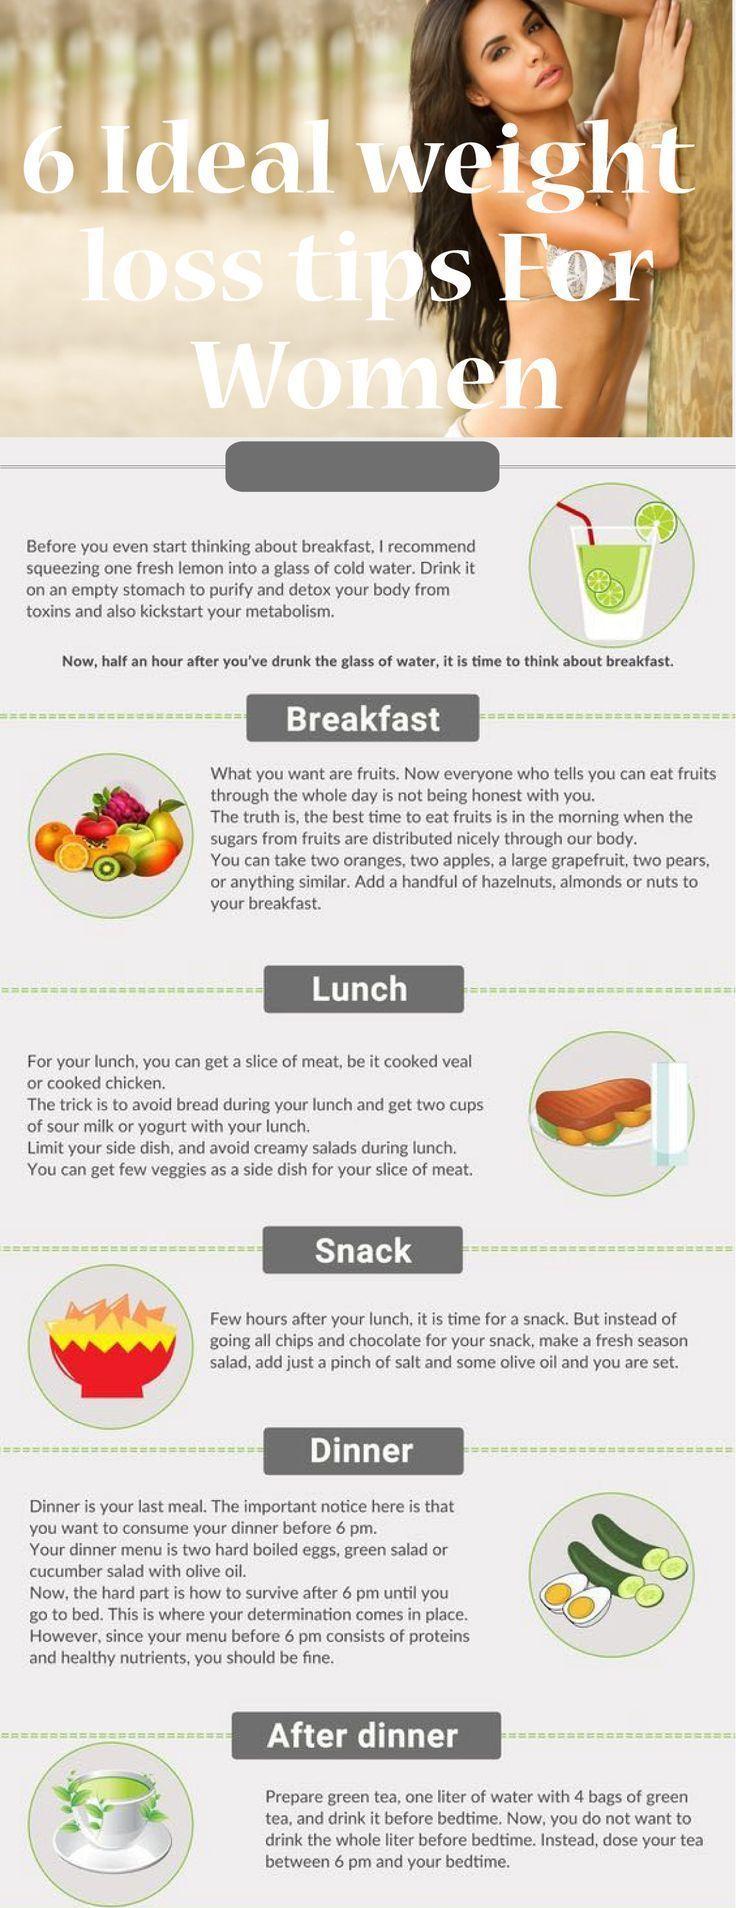 Natural weight loss supplements reviews photo 5